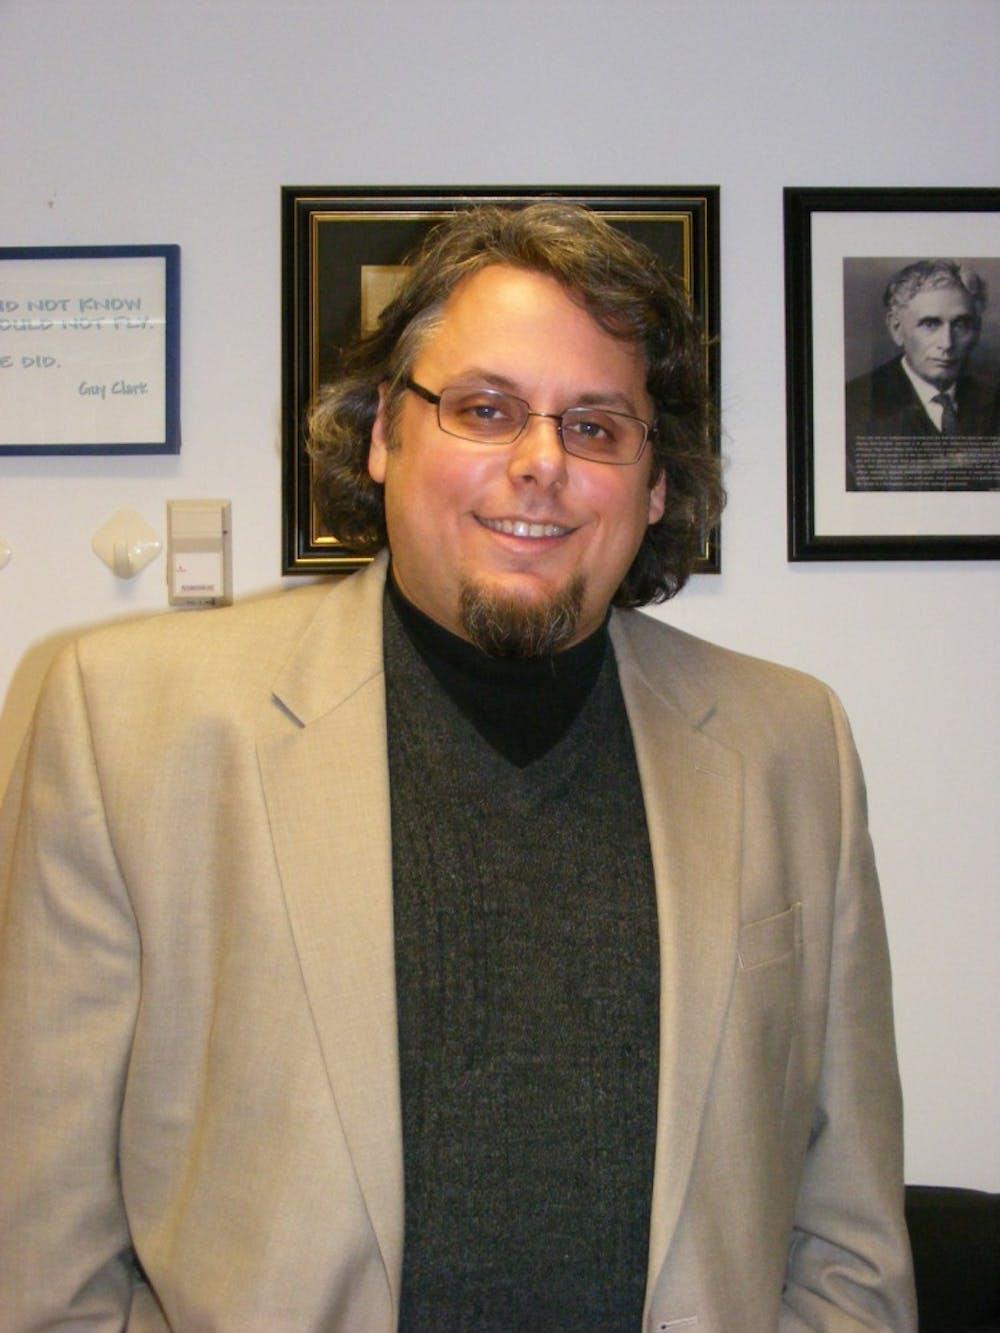 Lichtman gives interpretation of the Second Amendment